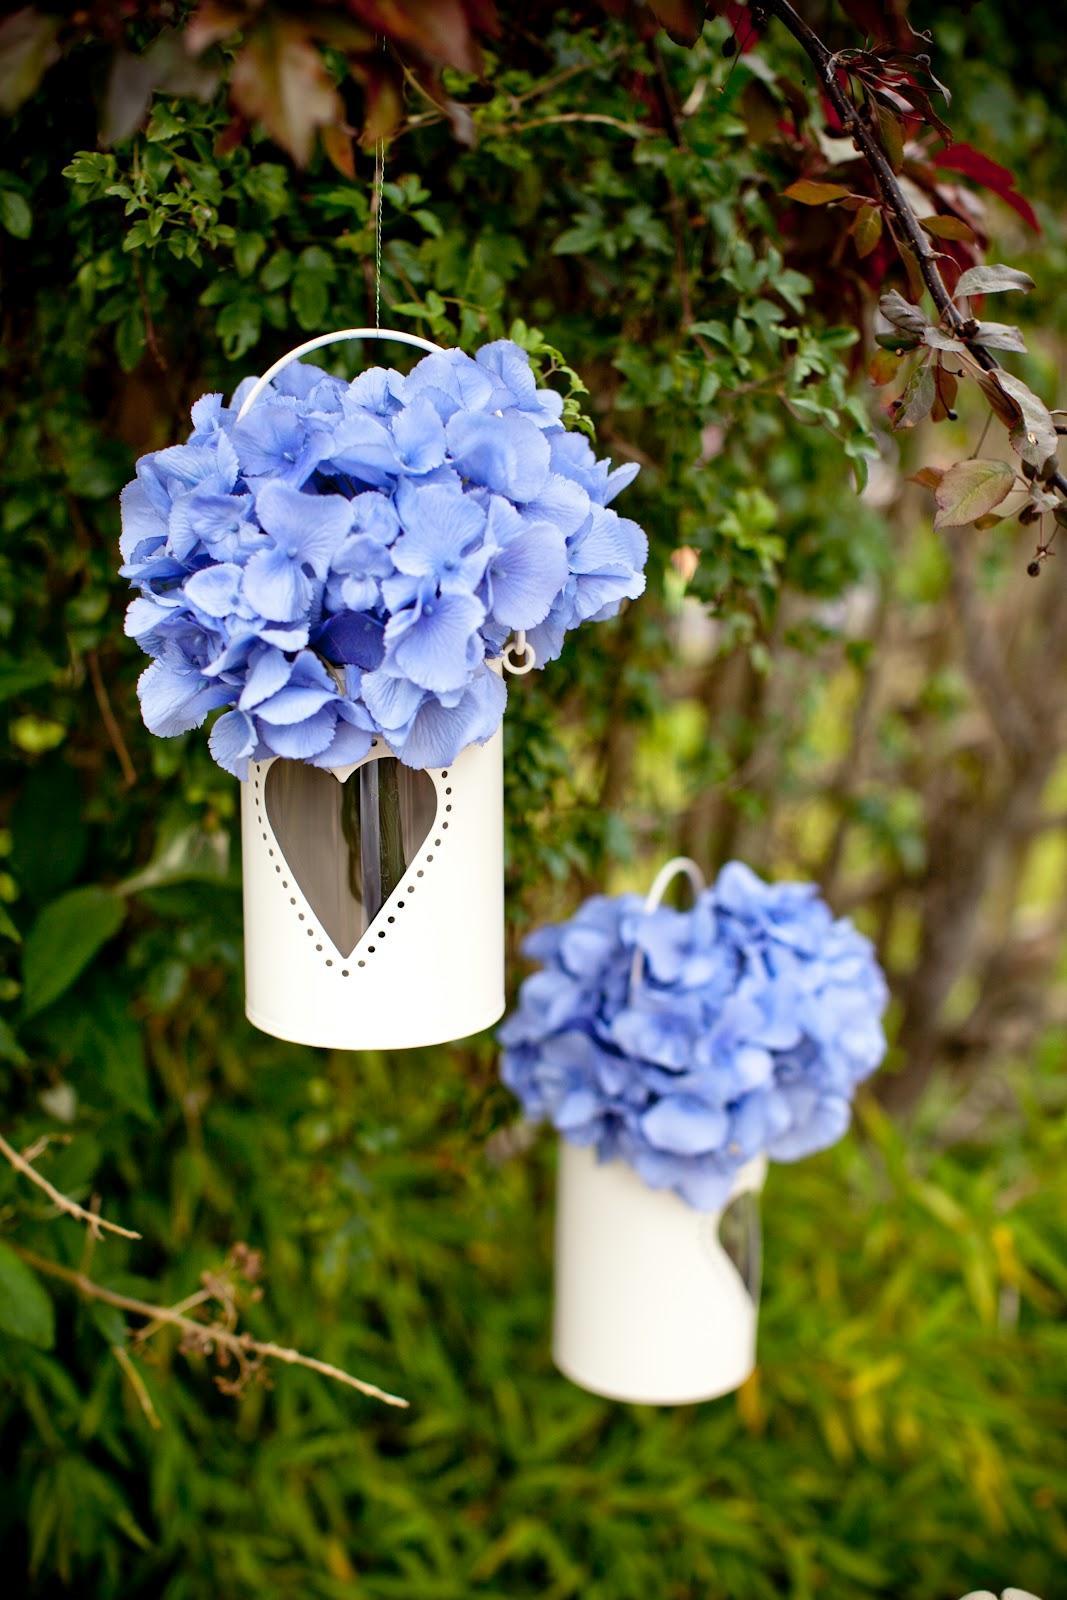 Metal Patio flower hanging